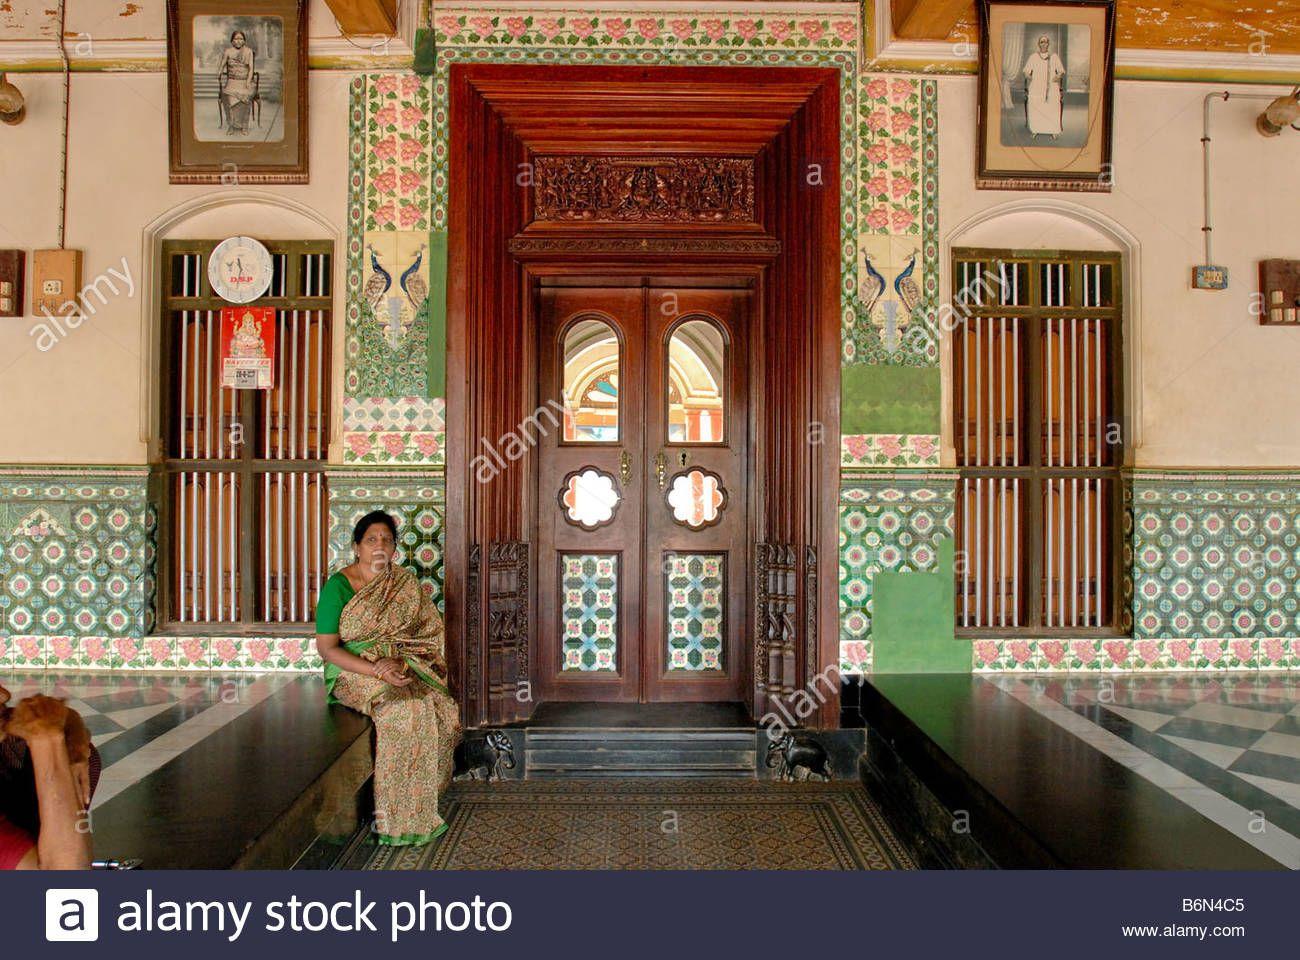 nattukottai-chettiar-house-in-chettinad-tamil-nadu-B6N4C5.jpg ...